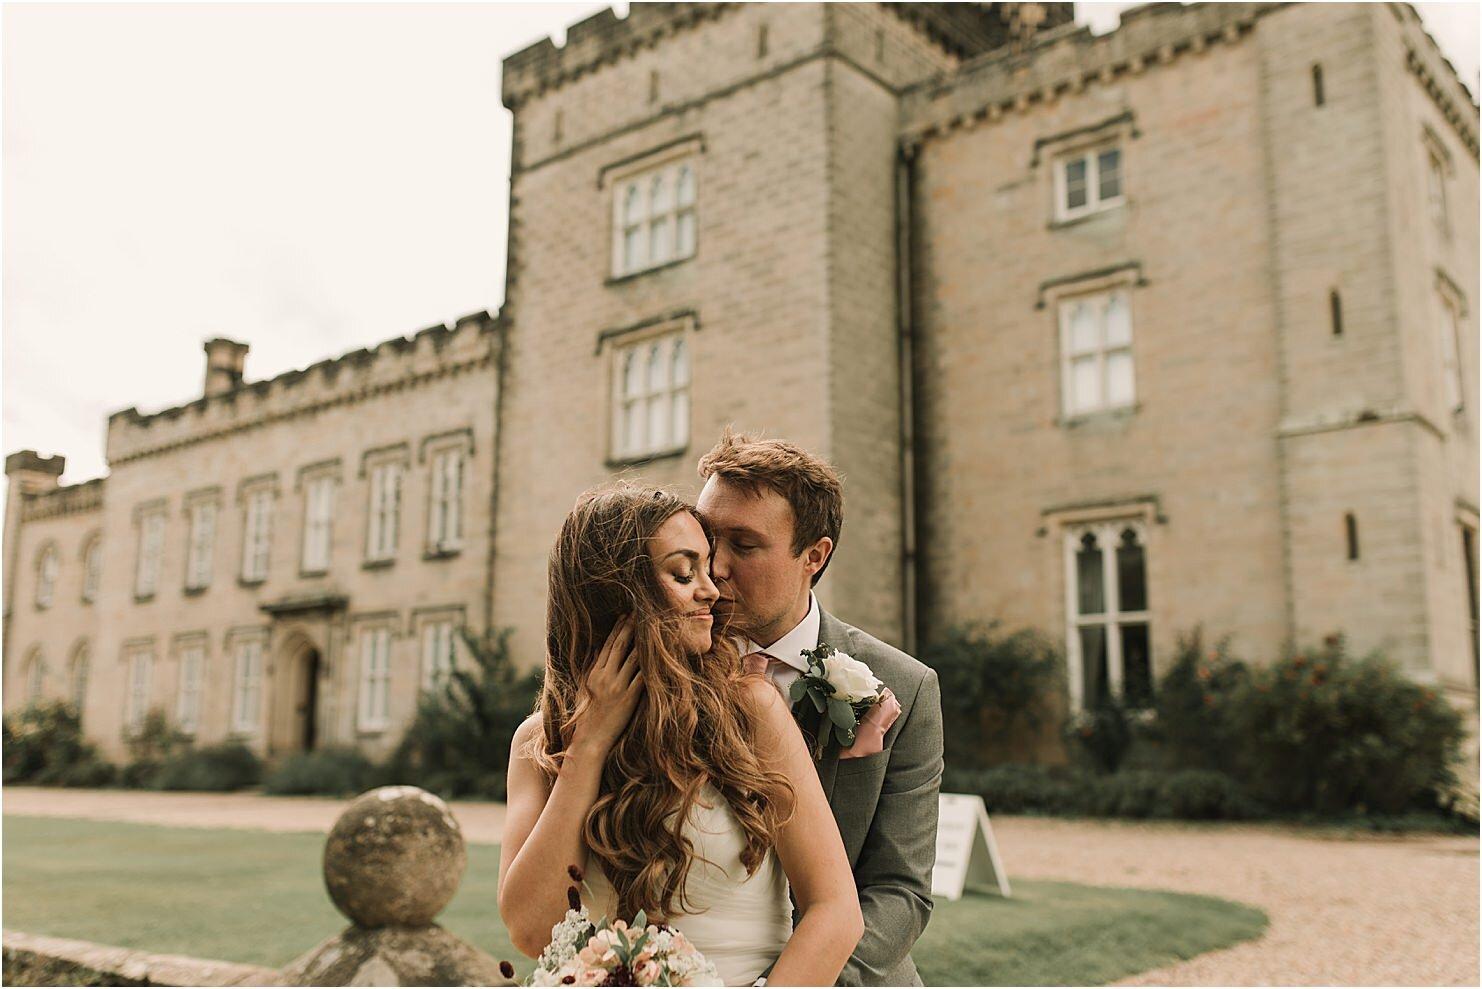 boda-de-cuento-en-castillo-boda-en-londres-66.jpg